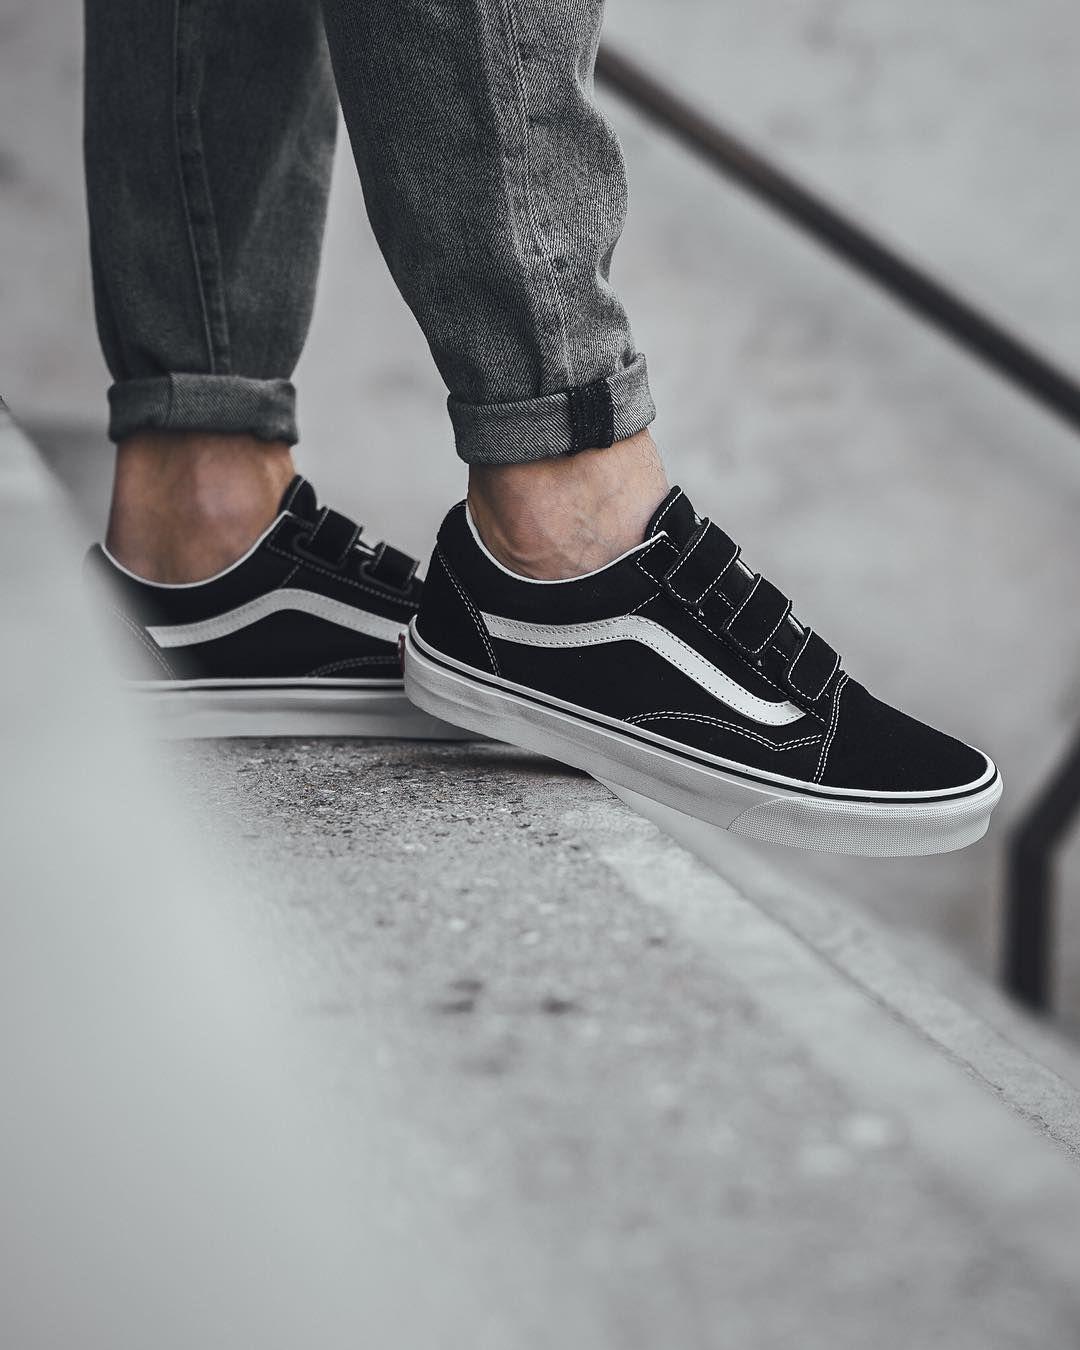 Vans Old Skool Velcro Black White Vans Shoes Women Velcro Shoes Vans